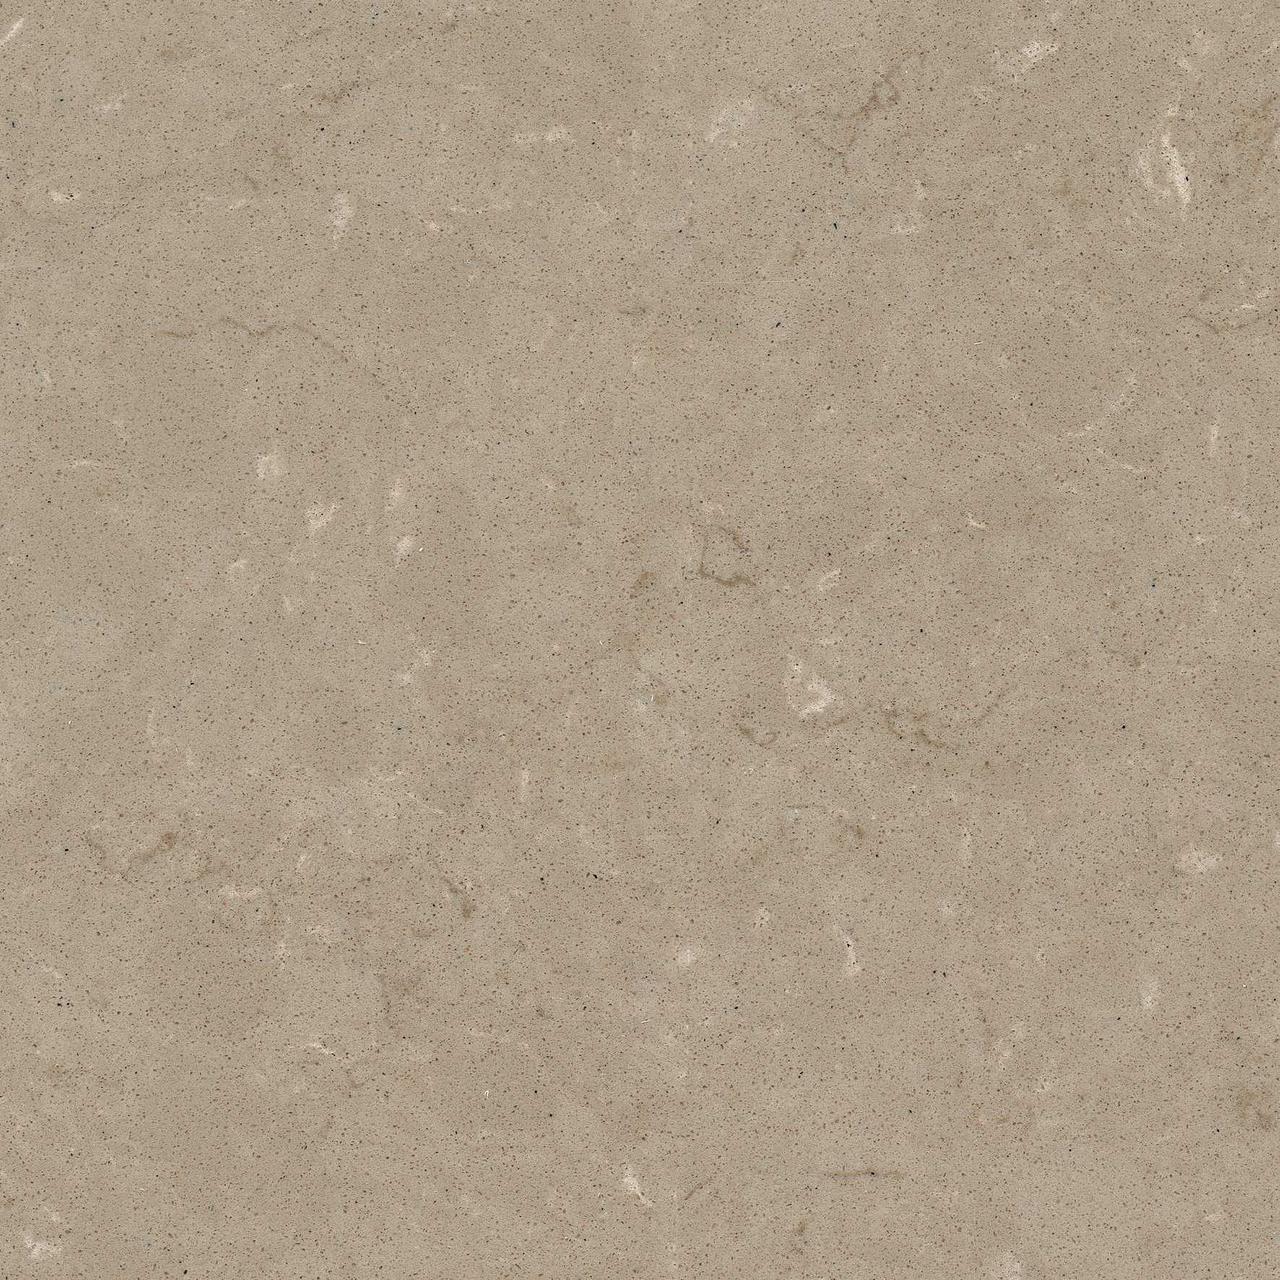 Искусственный камень, Кварц Silestone Coral Clay 20 мм